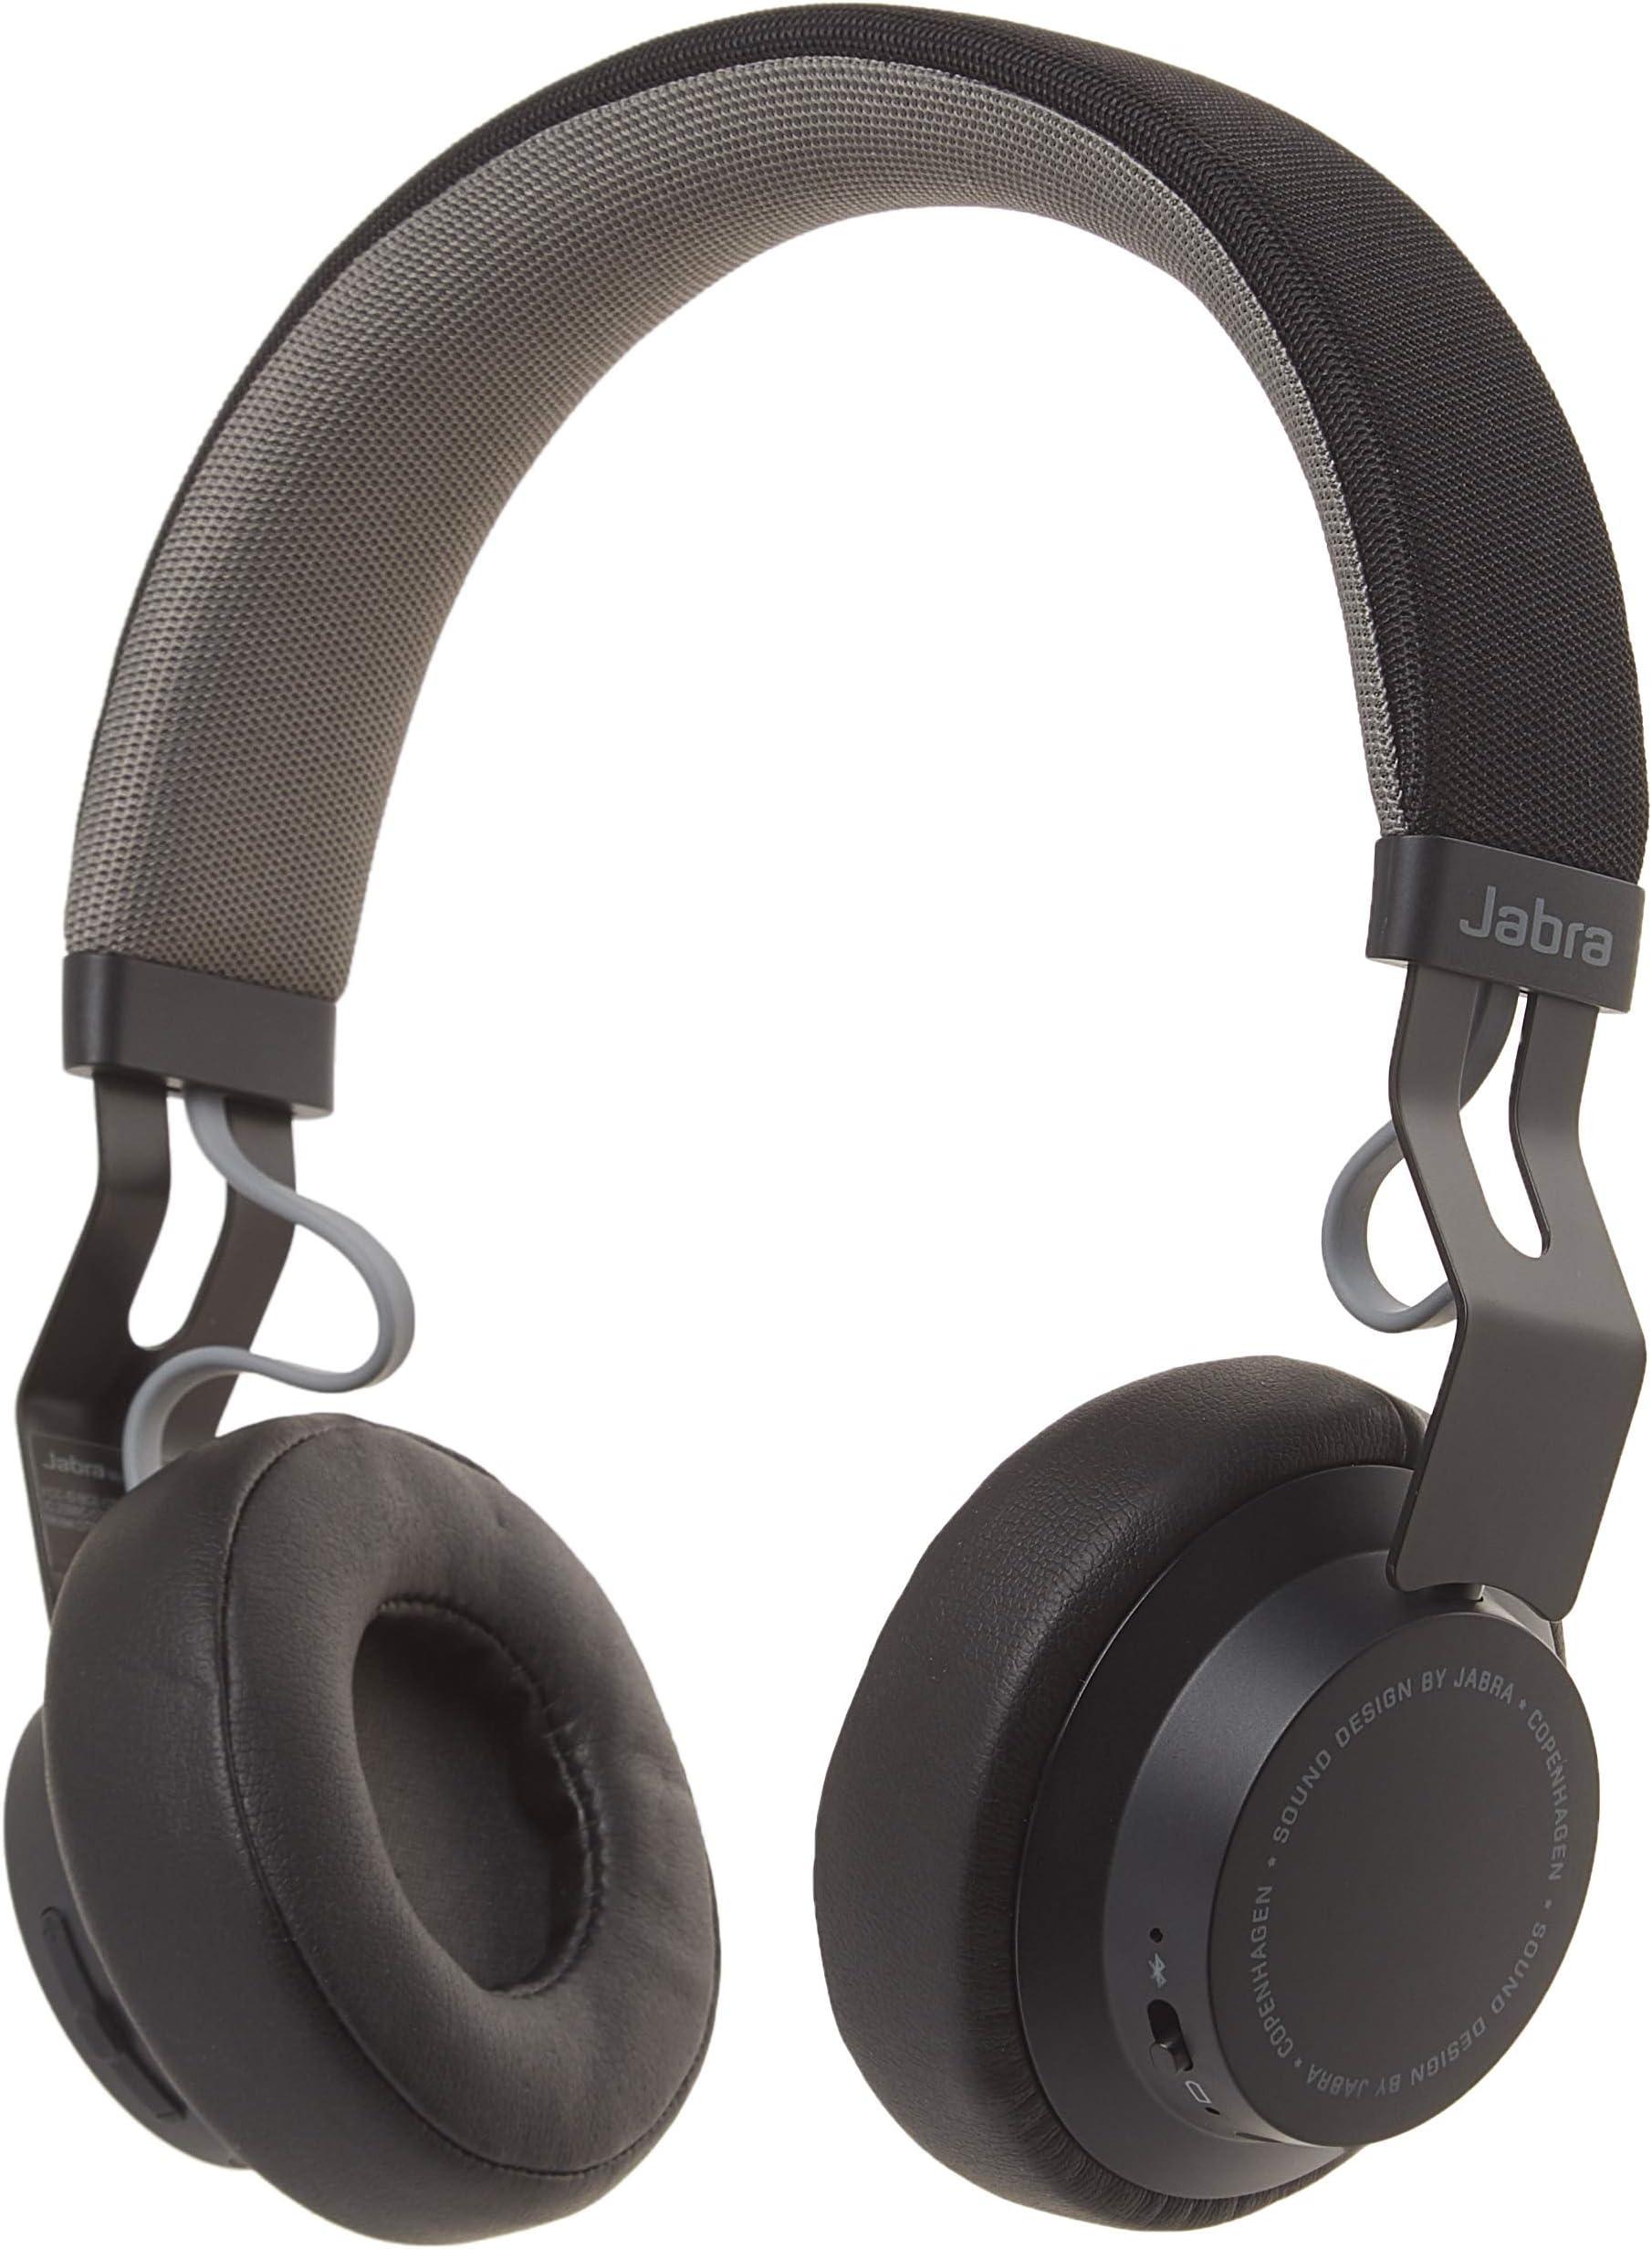 Jabra Move Wireless Stereo Headphones - Black